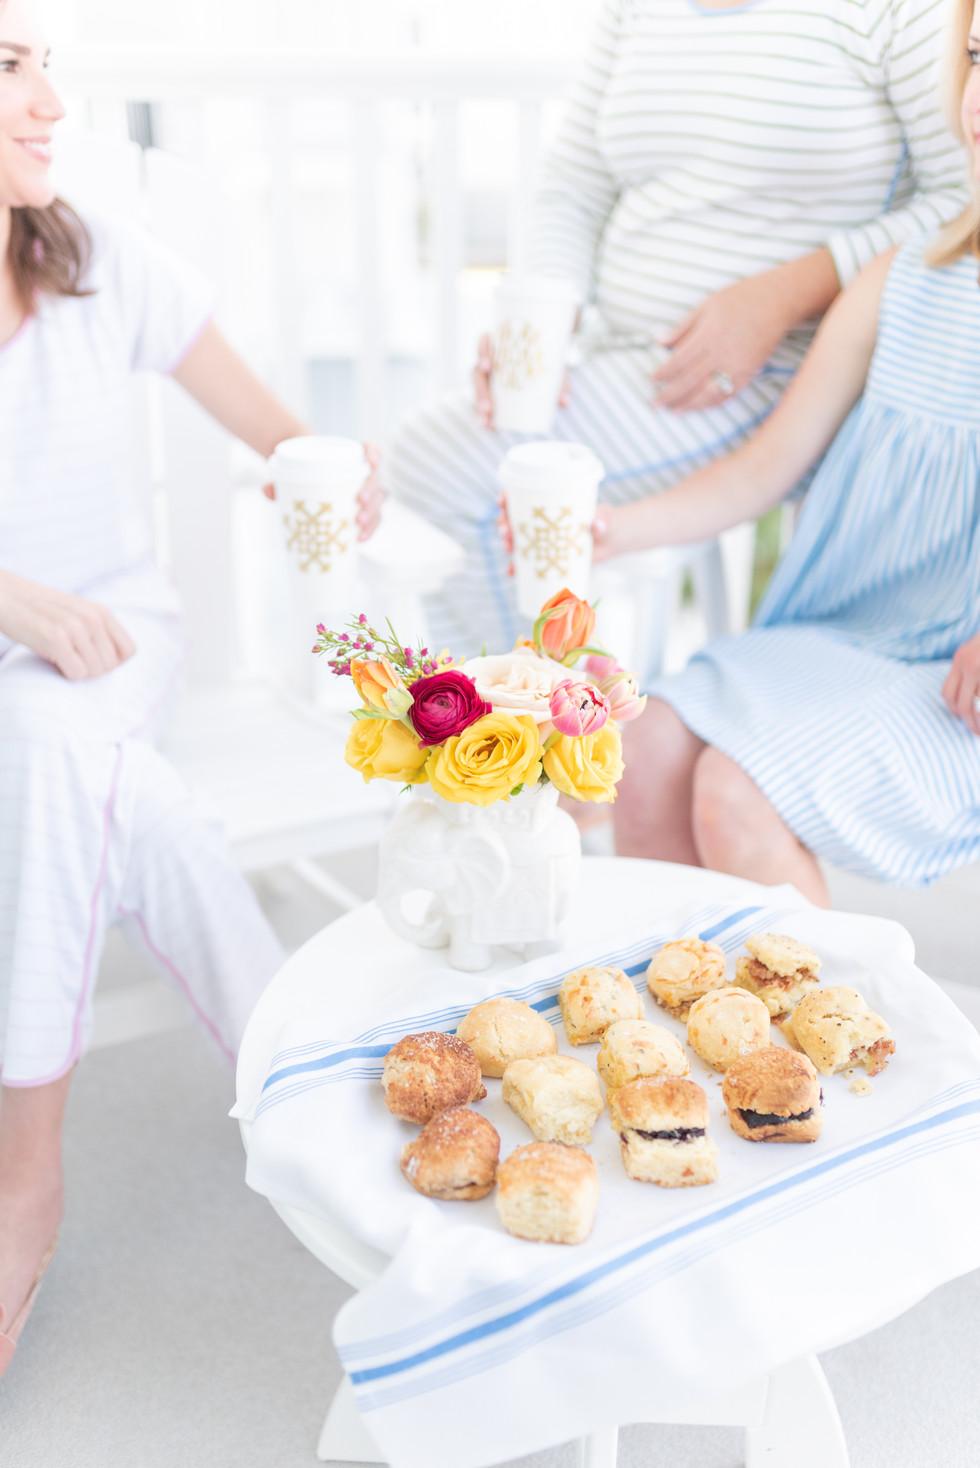 TSC-Ladies-Hotel-Callies-May-2019-37.jpg